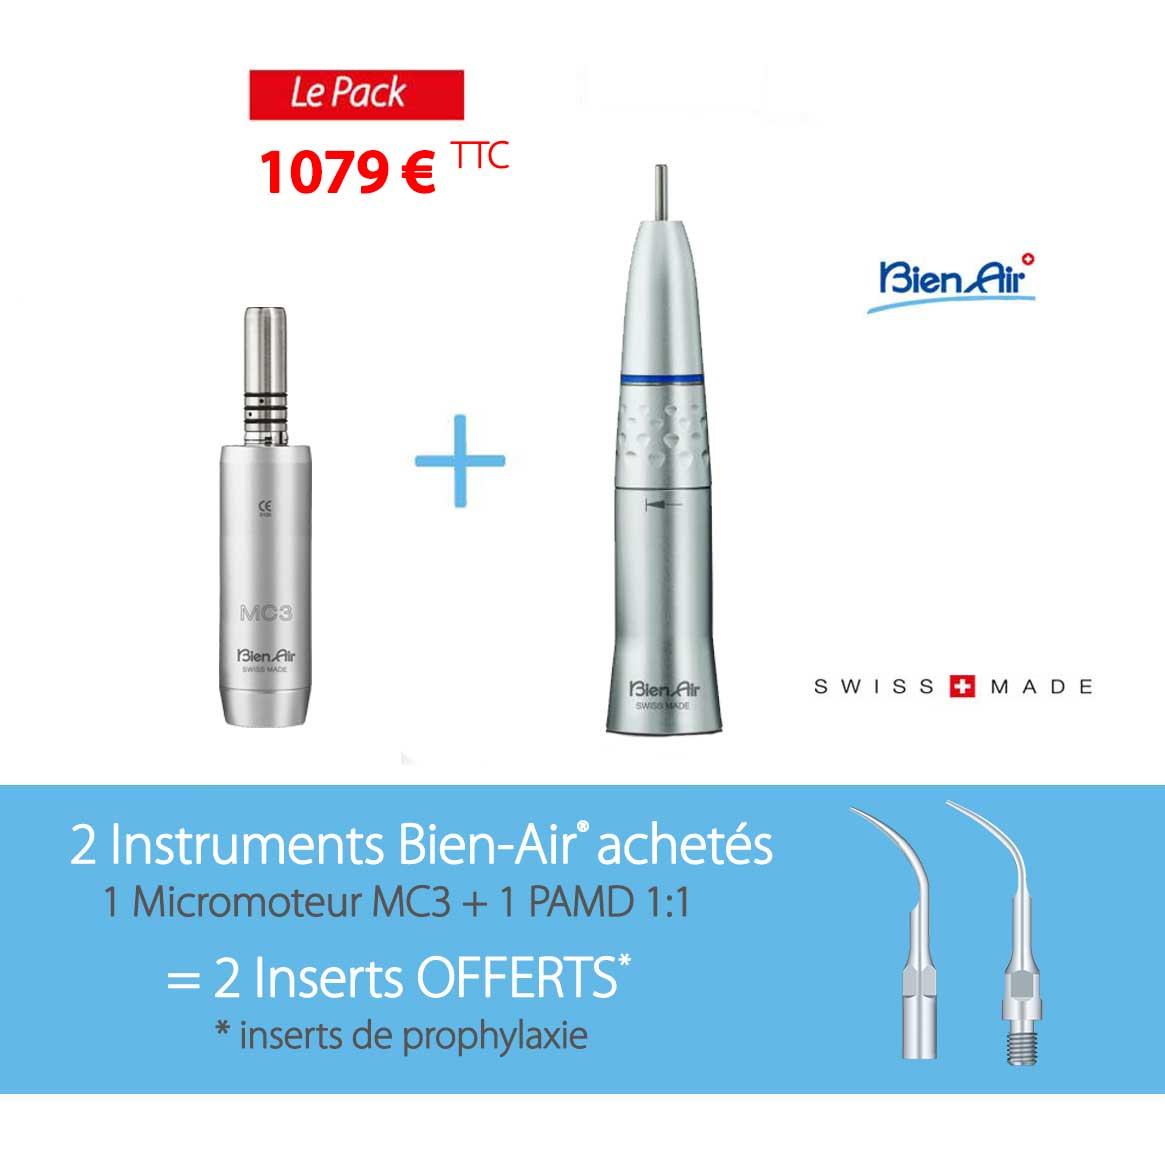 Lot 2 instruments Bien-Air + 2 inserts Offerts